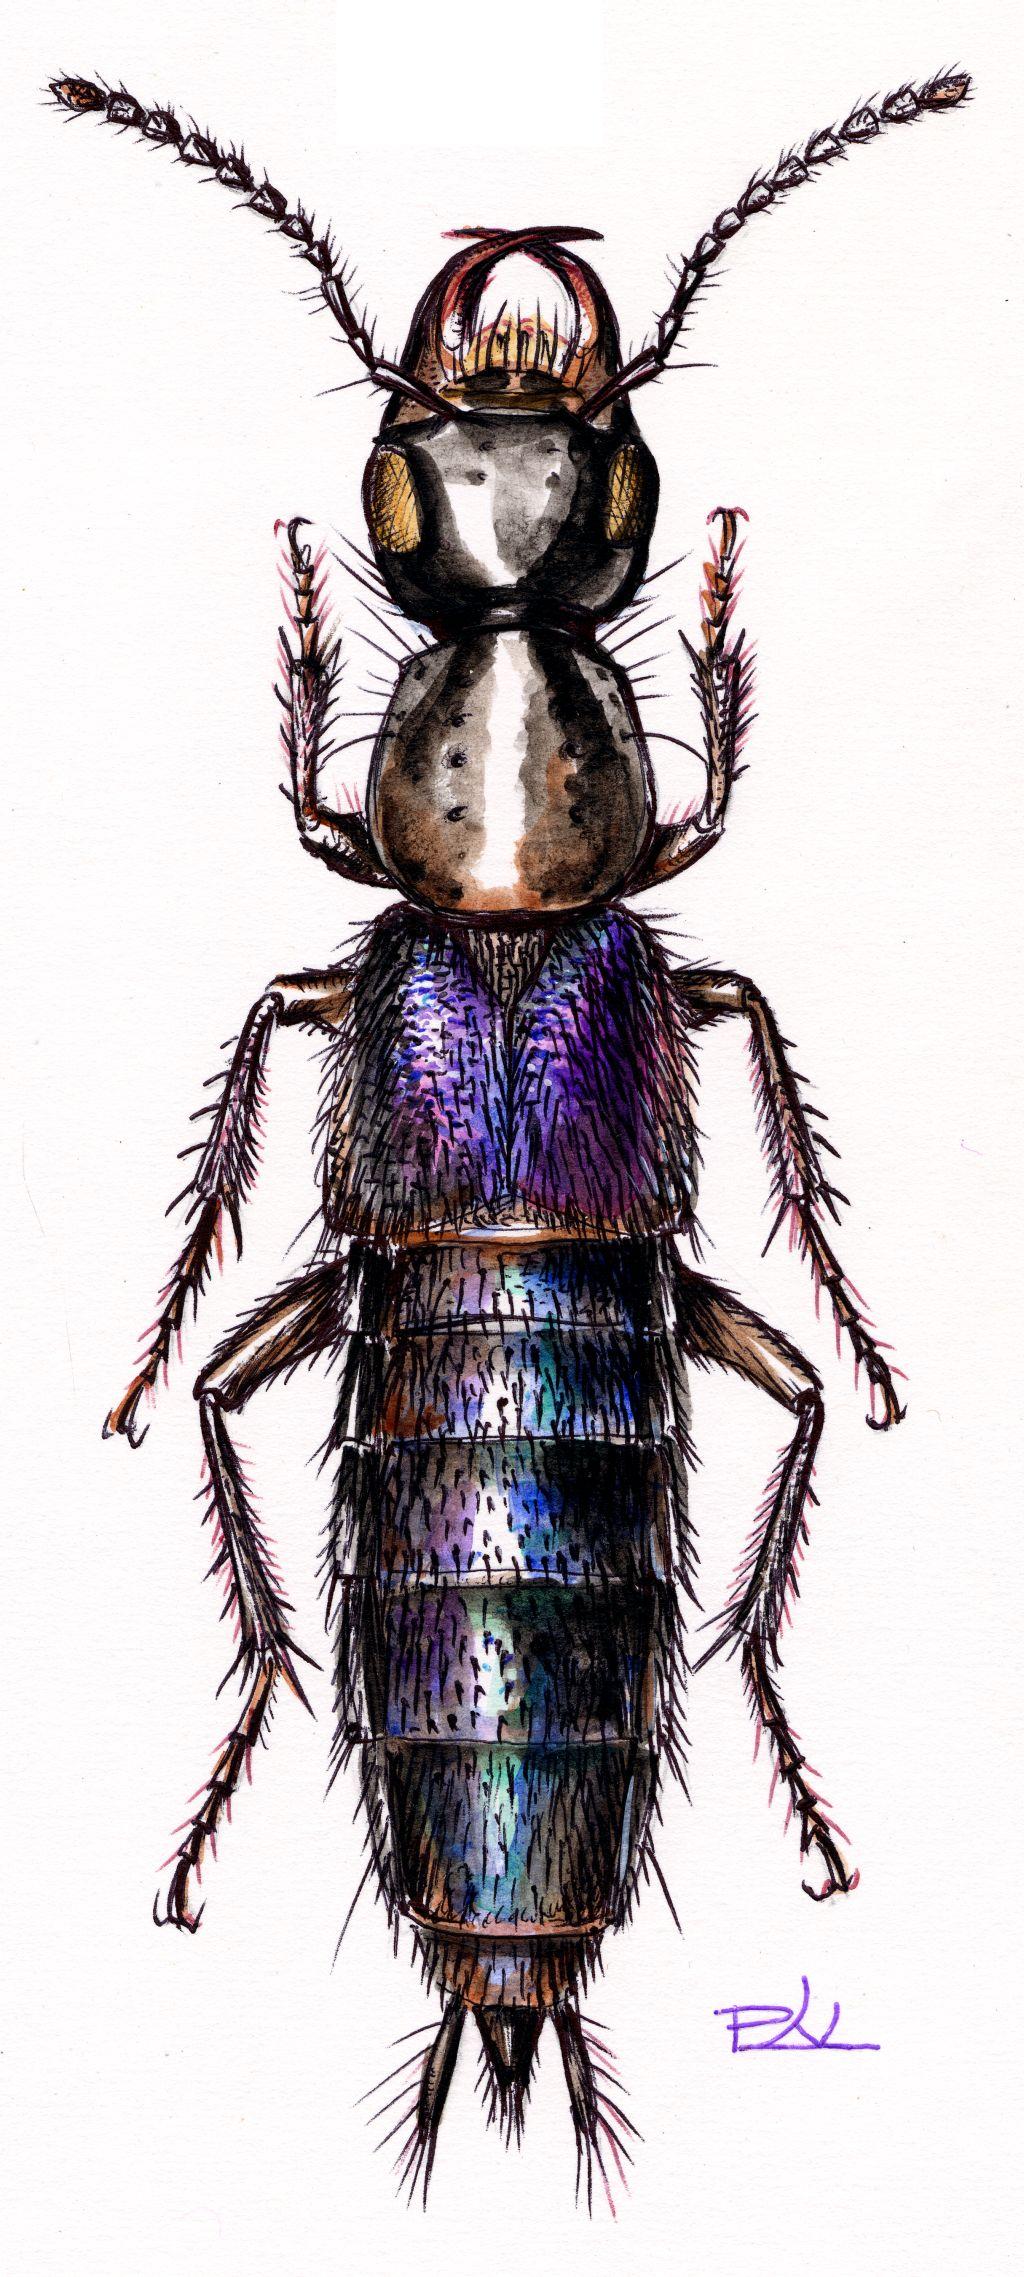 Ibolyaszínű ganajholyva (Philonthus cyanipennis)